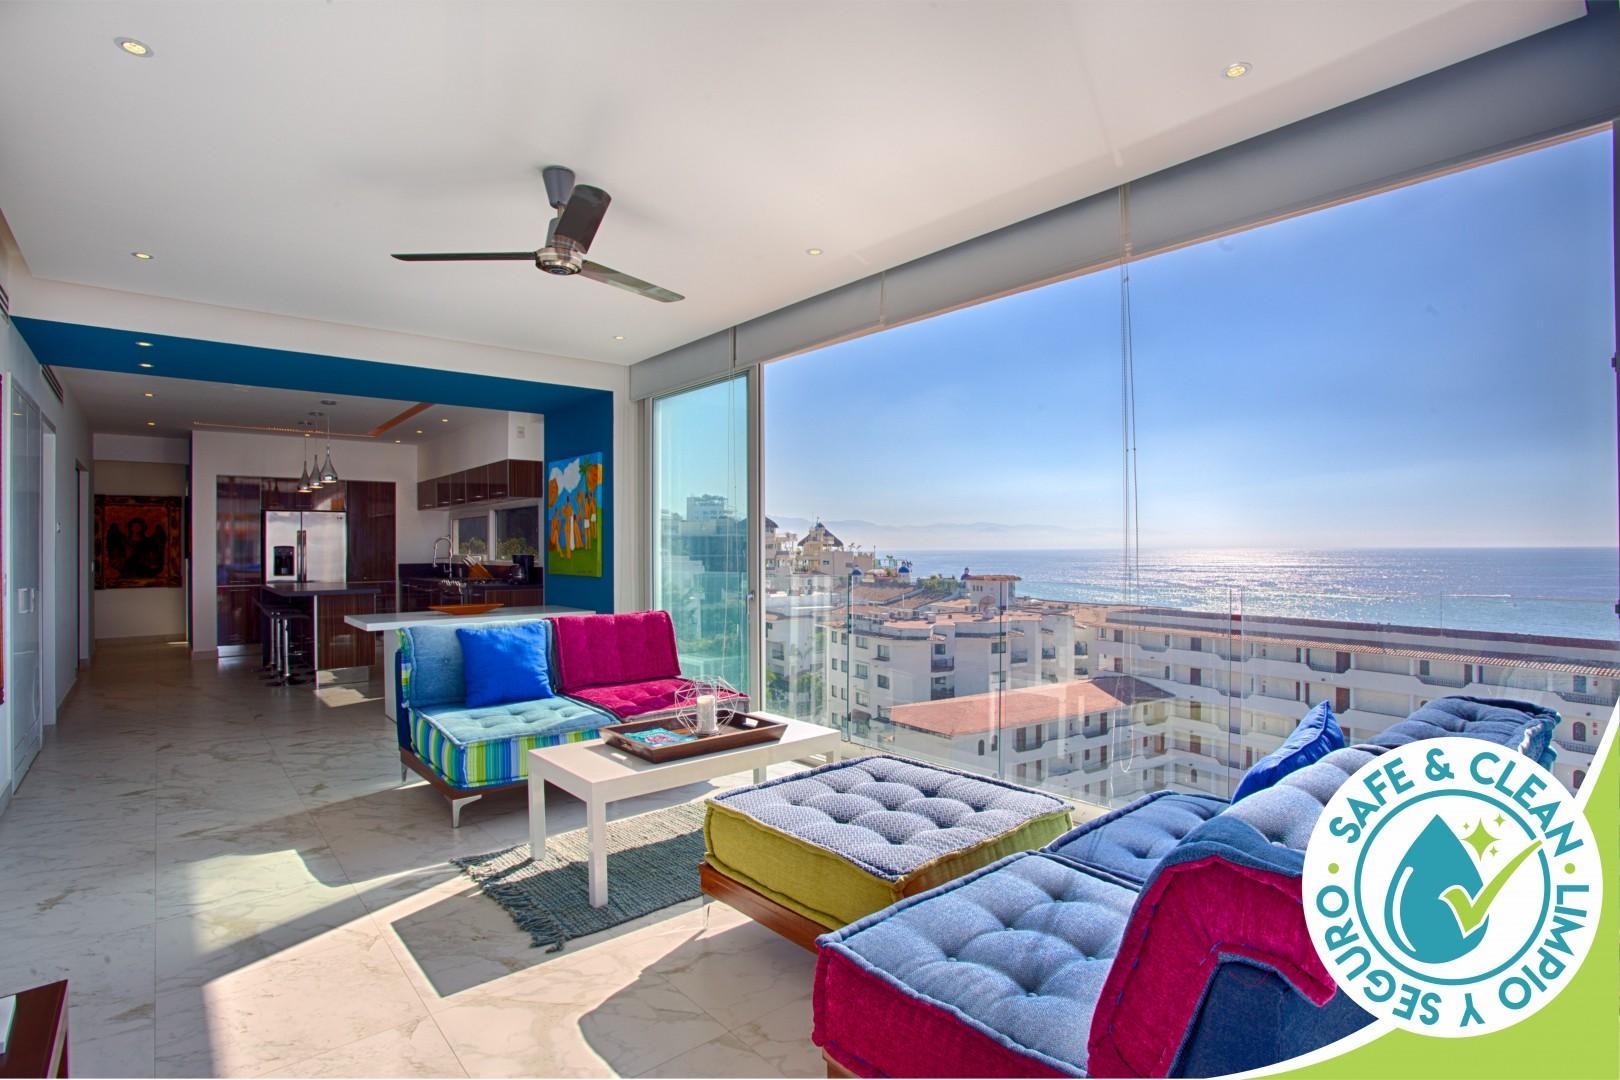 Spectacular Ocean Views at quiet but central D'Terrace Designer Condo